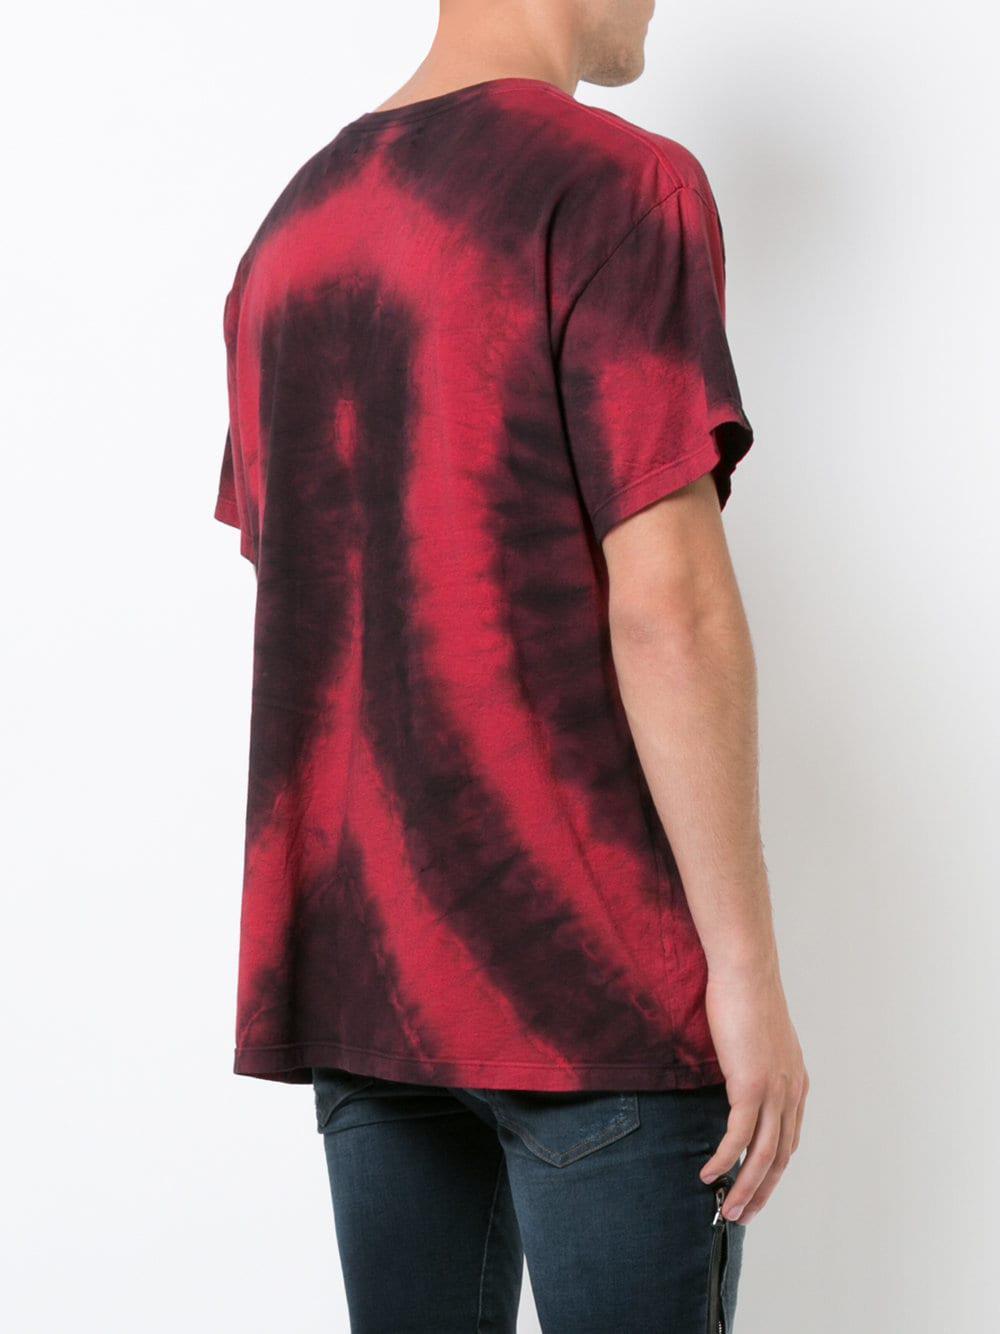 bee628c5 Amiri Heart Tie-dye T-shirt in Red for Men - Lyst